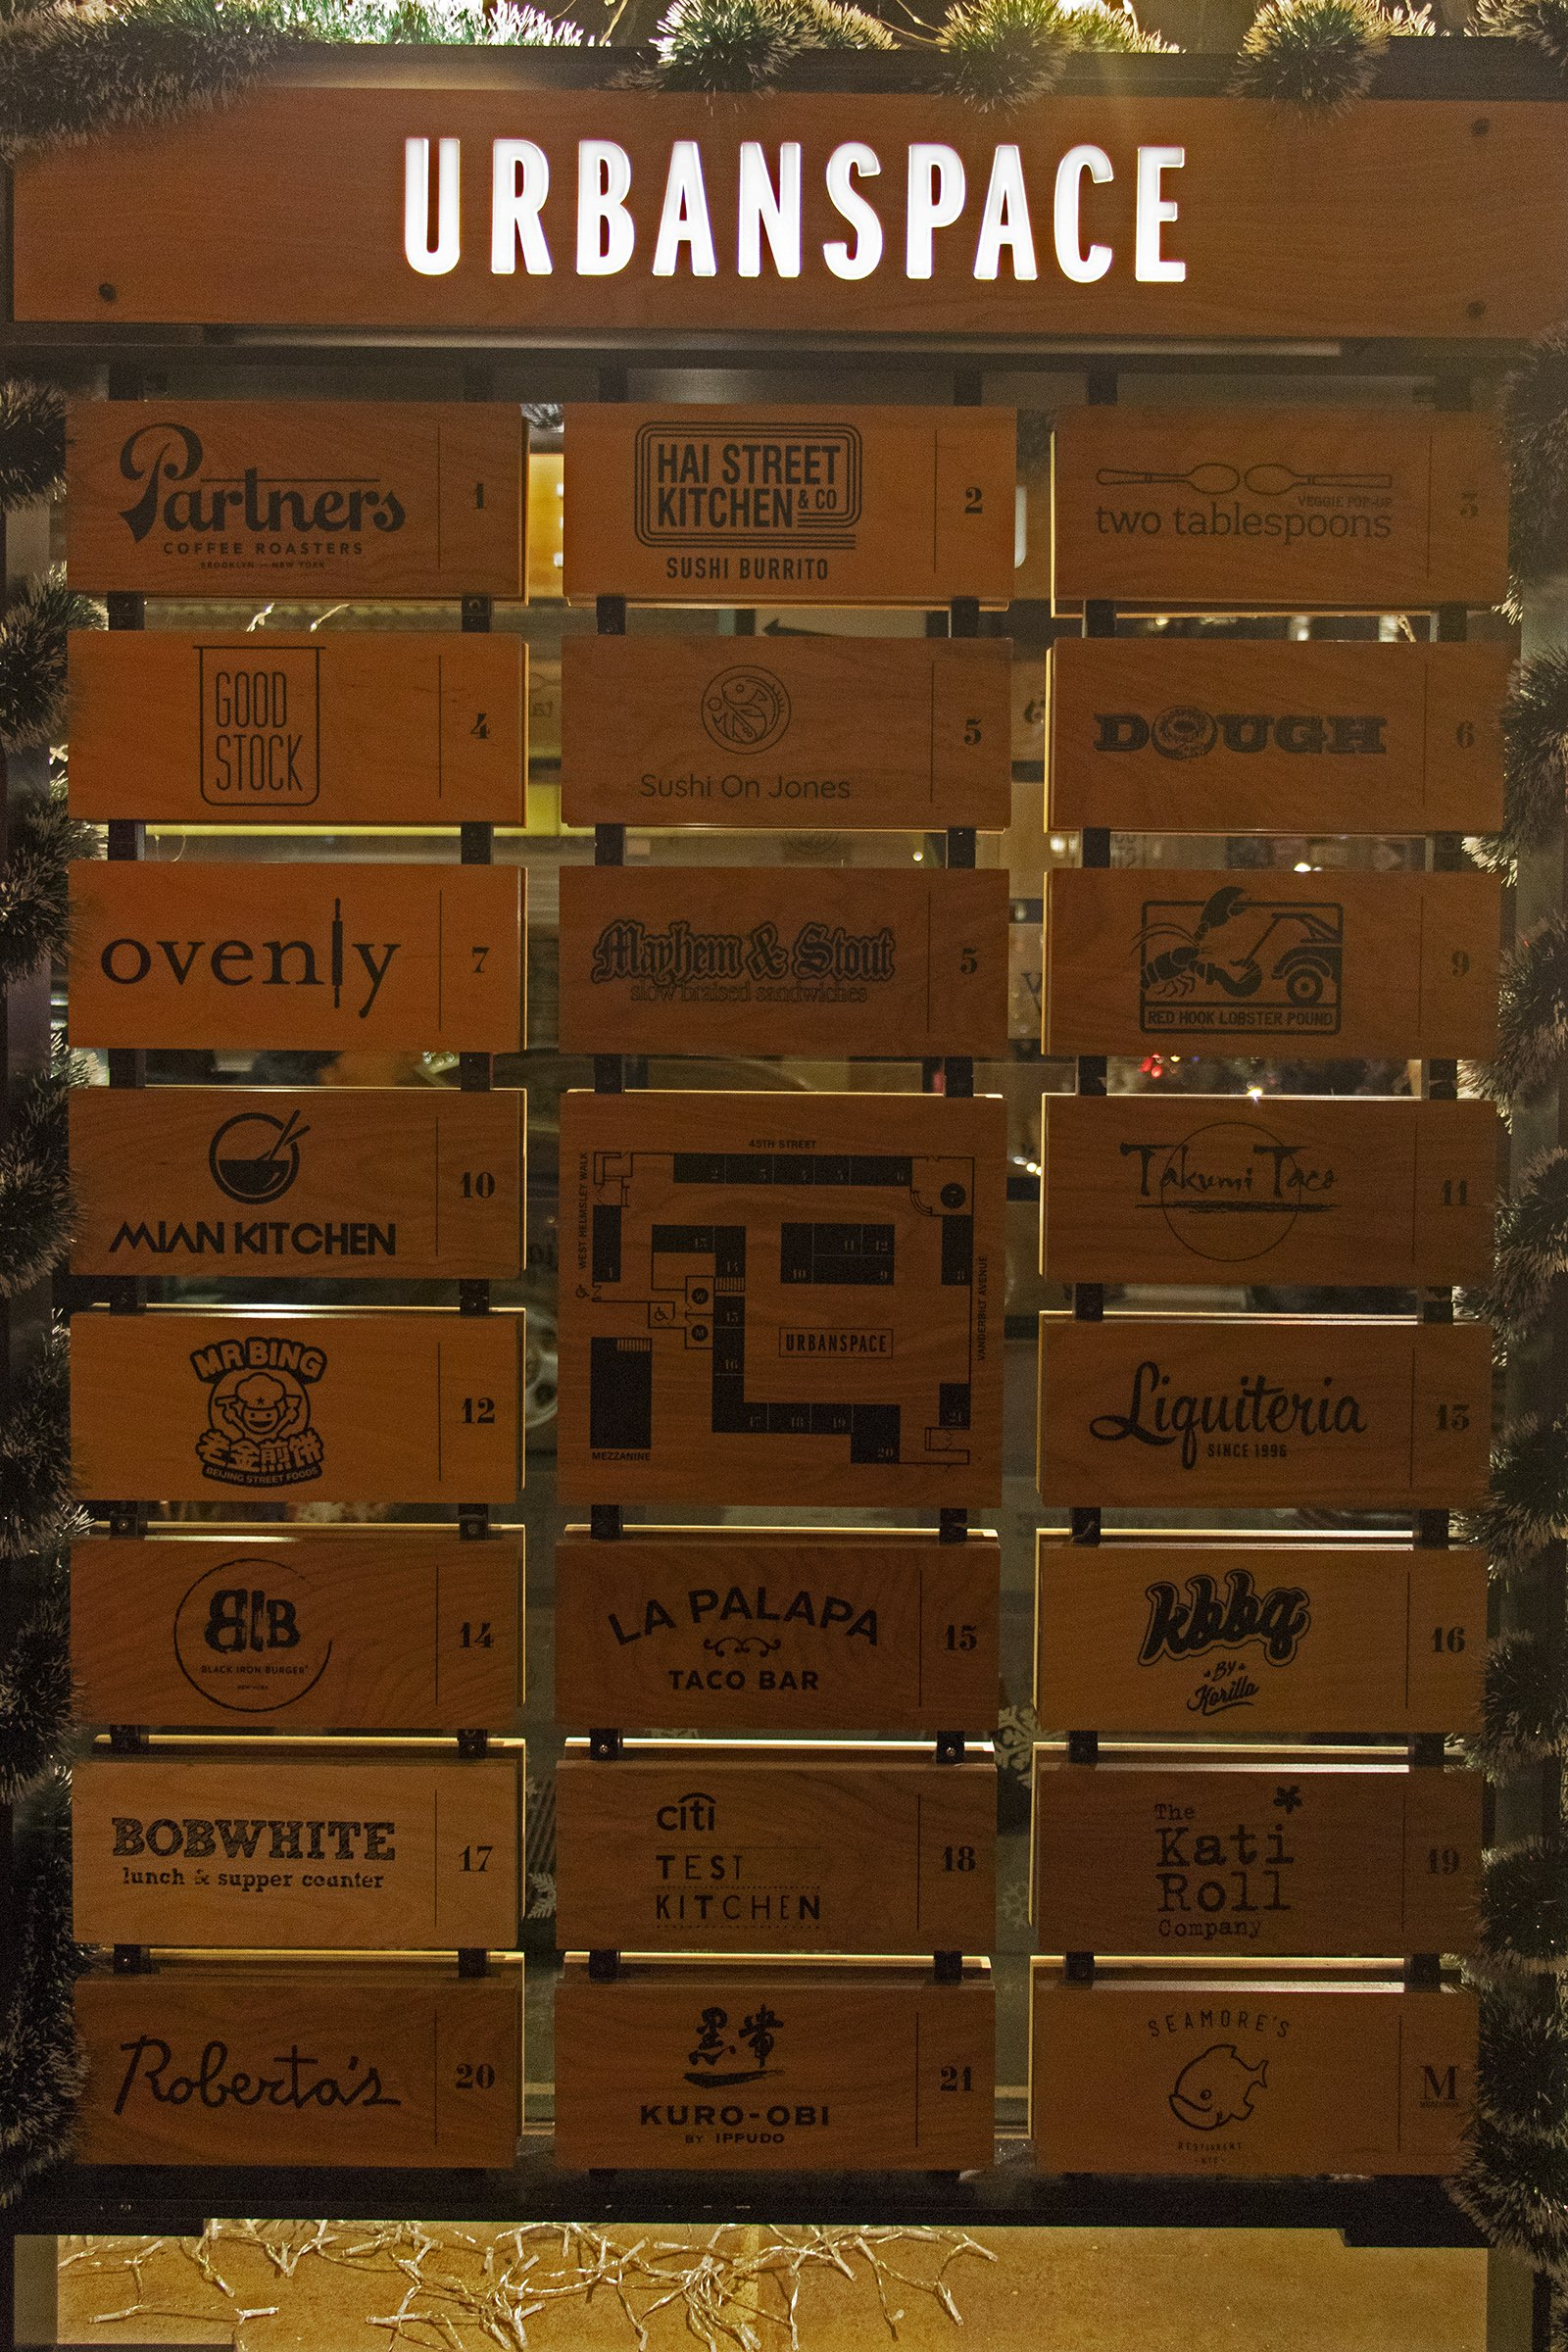 Urbanspace Vanderbilt vendor sign